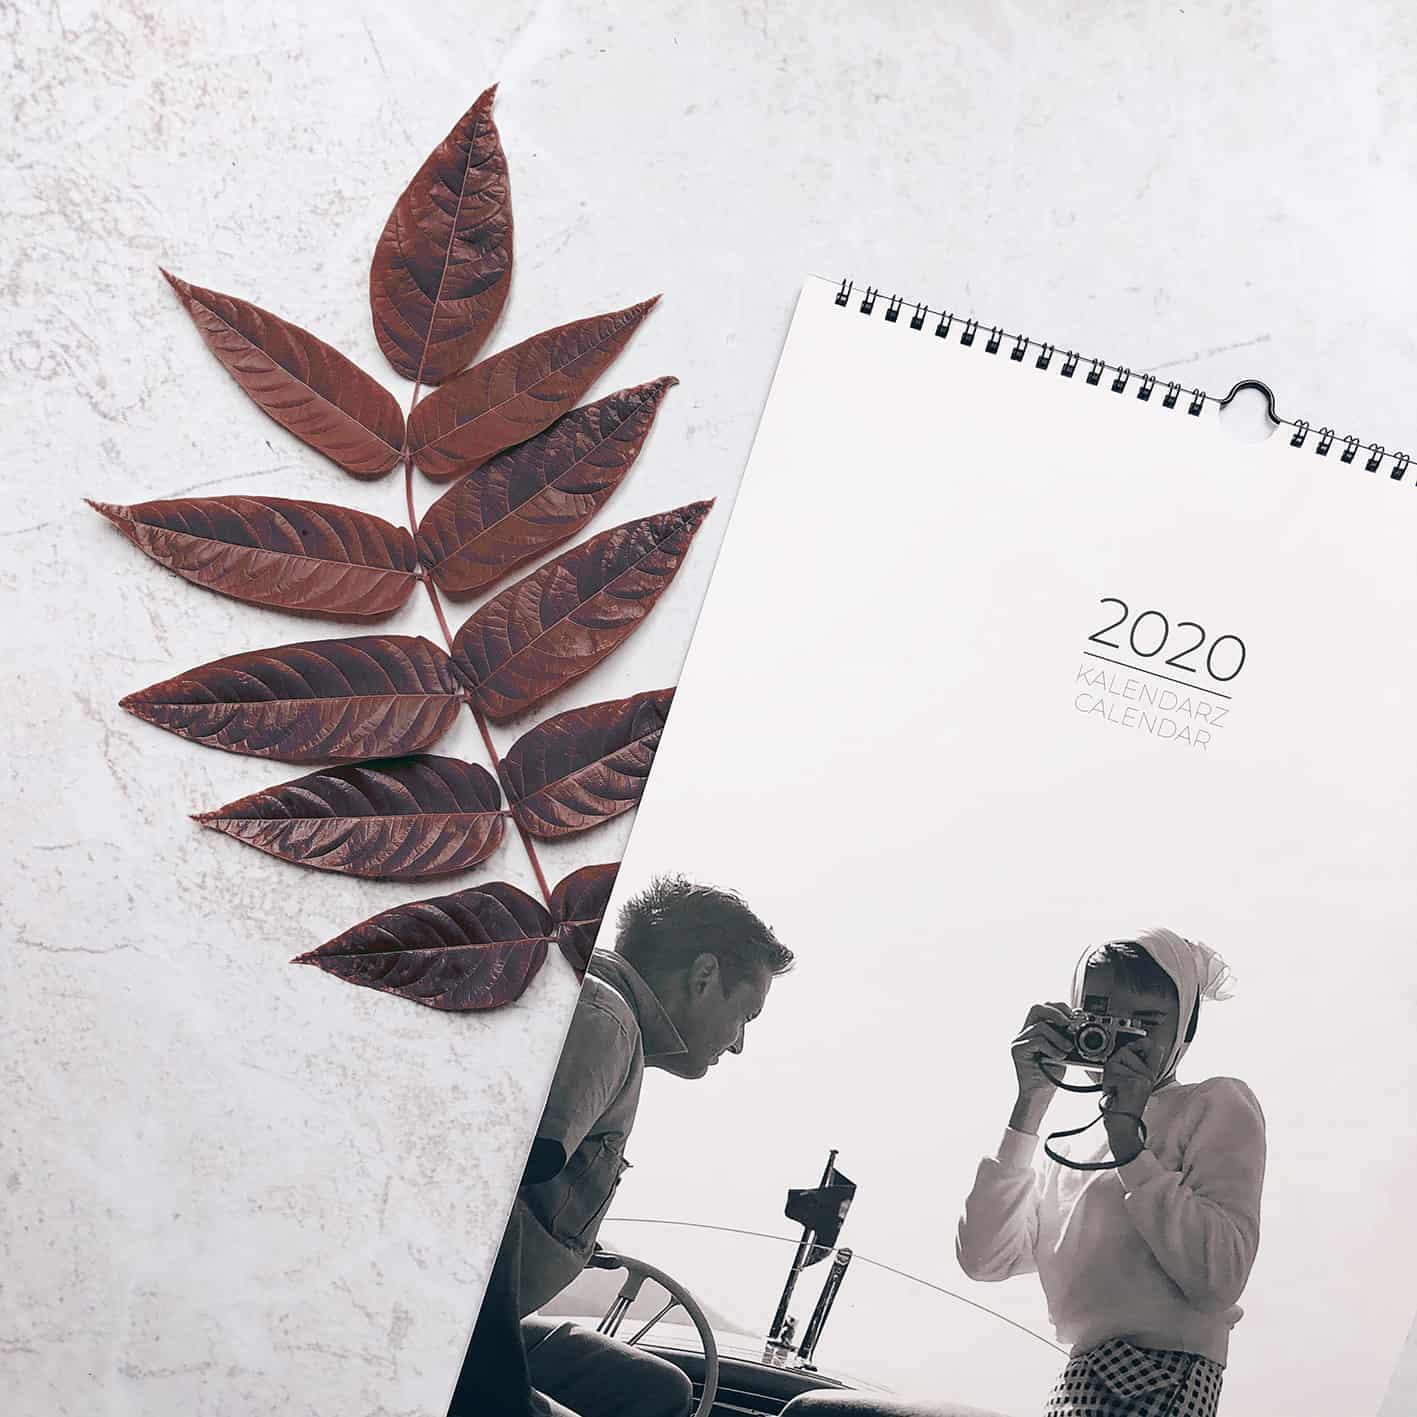 kalendarz-pomysl-na-prezent-2